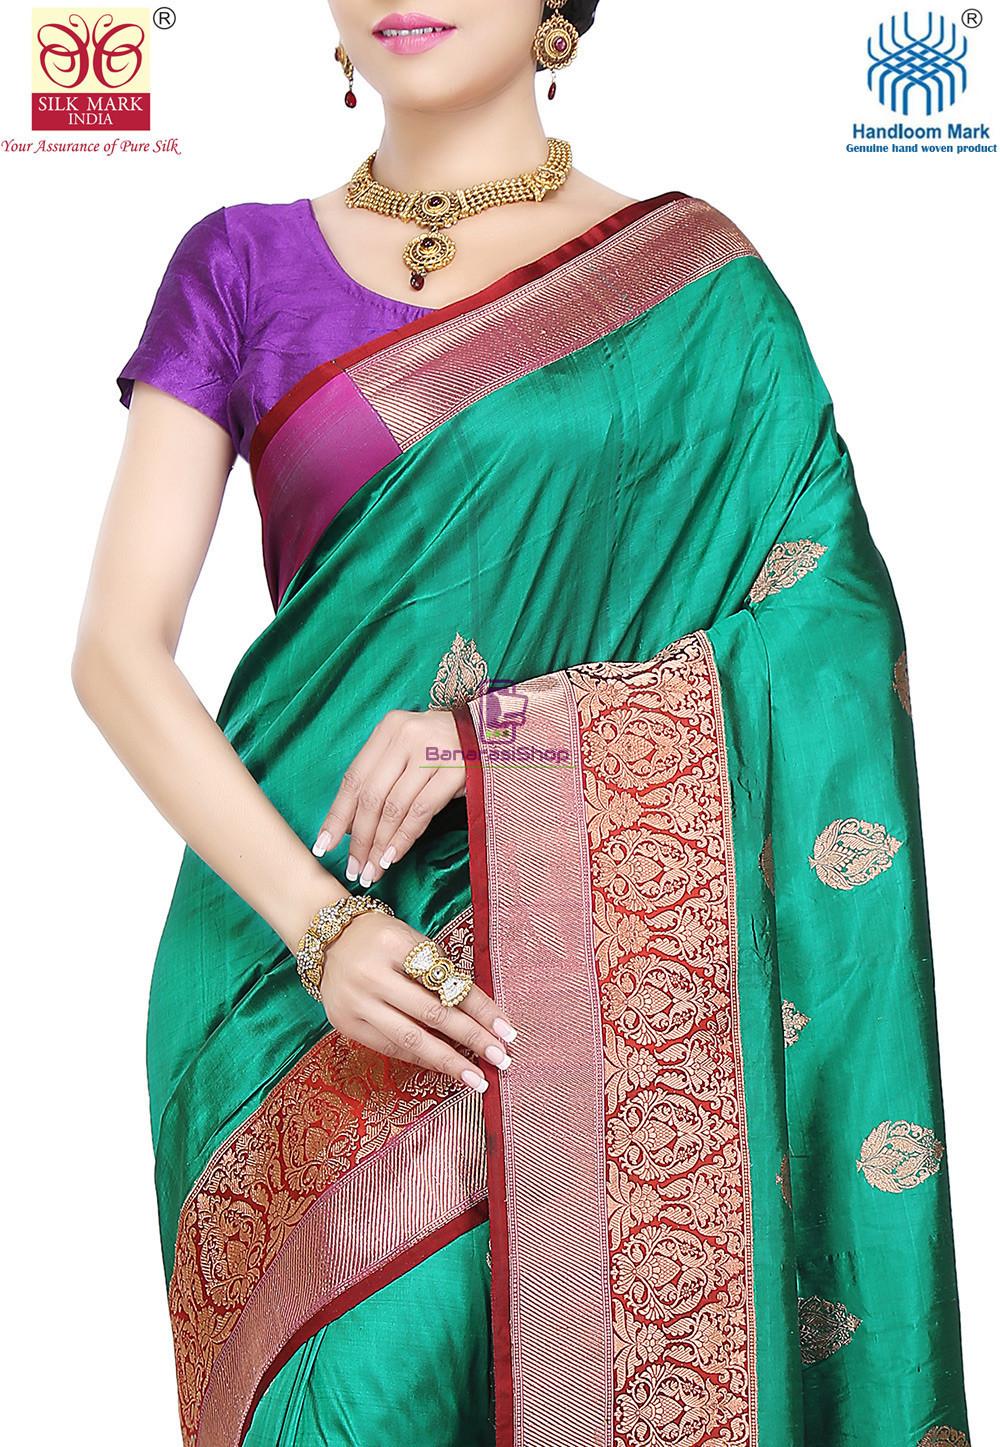 Banarasi Pure Katan Silk Handloom Saree in Teal Green 2